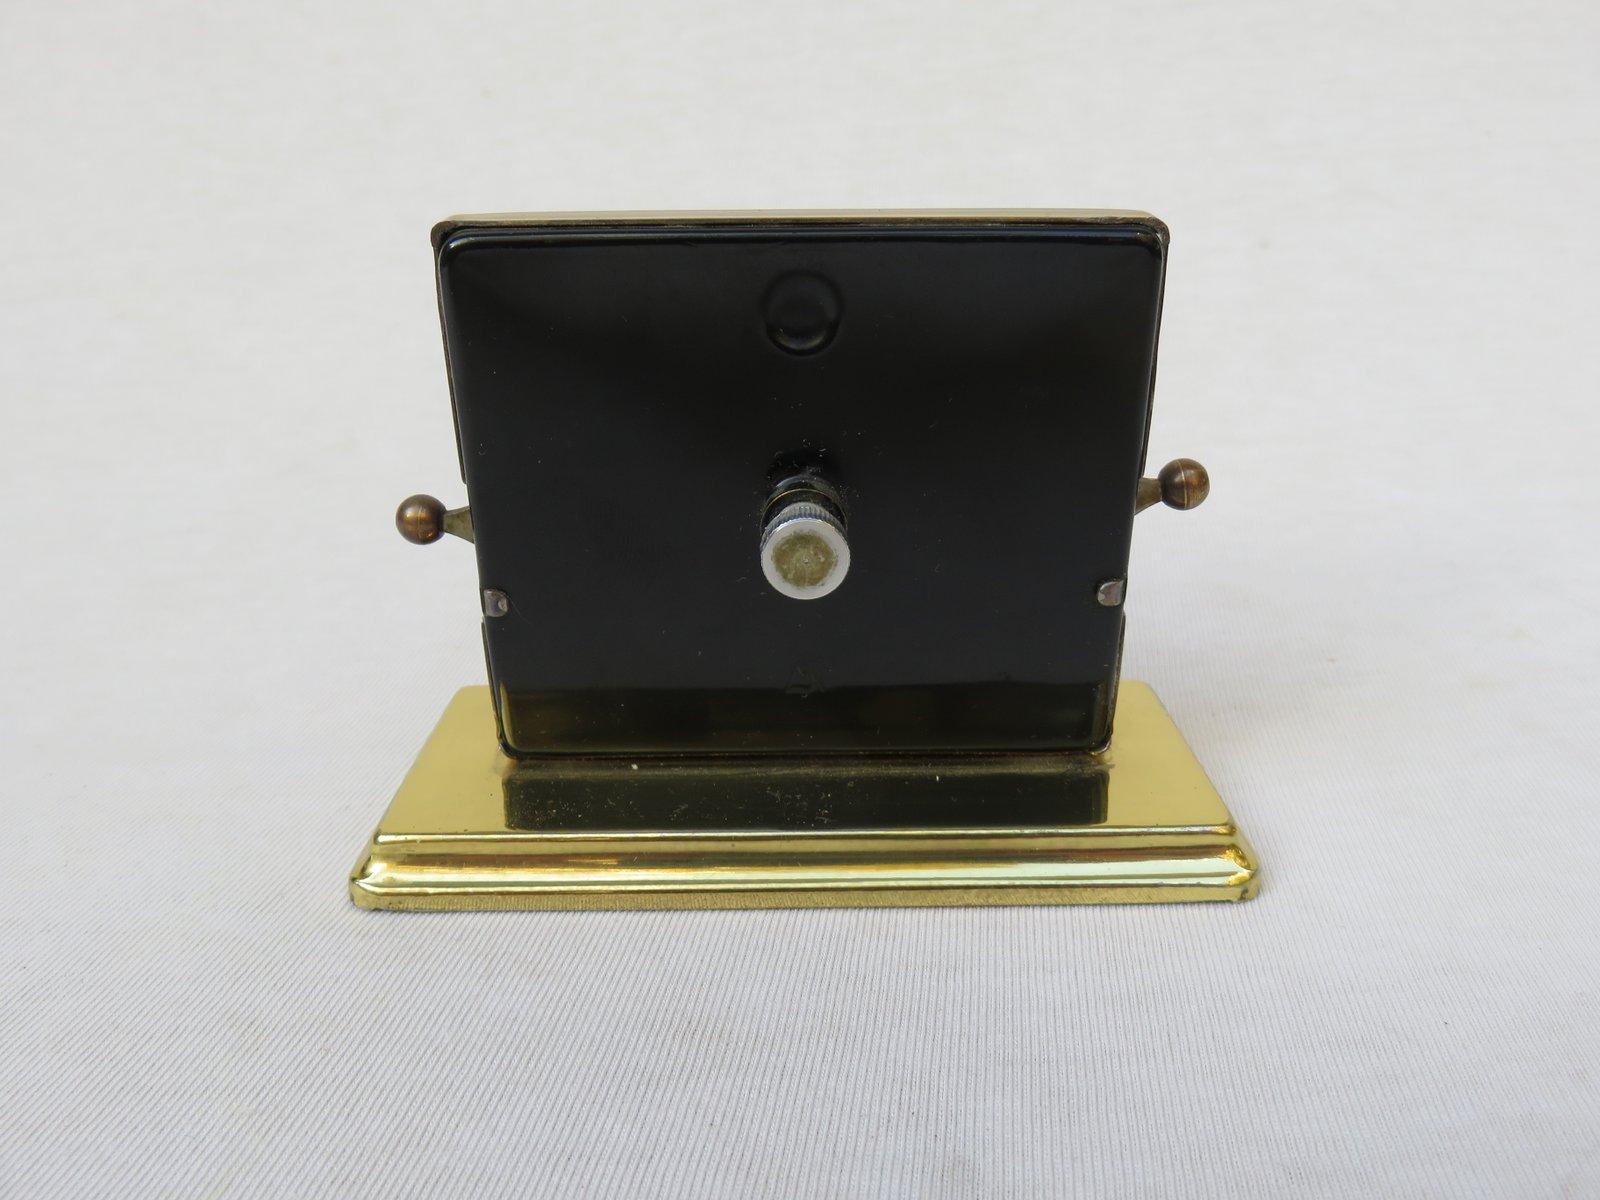 Perpetual Calendar Art Deco : Art deco brass perpetual calendar from jakob maul s